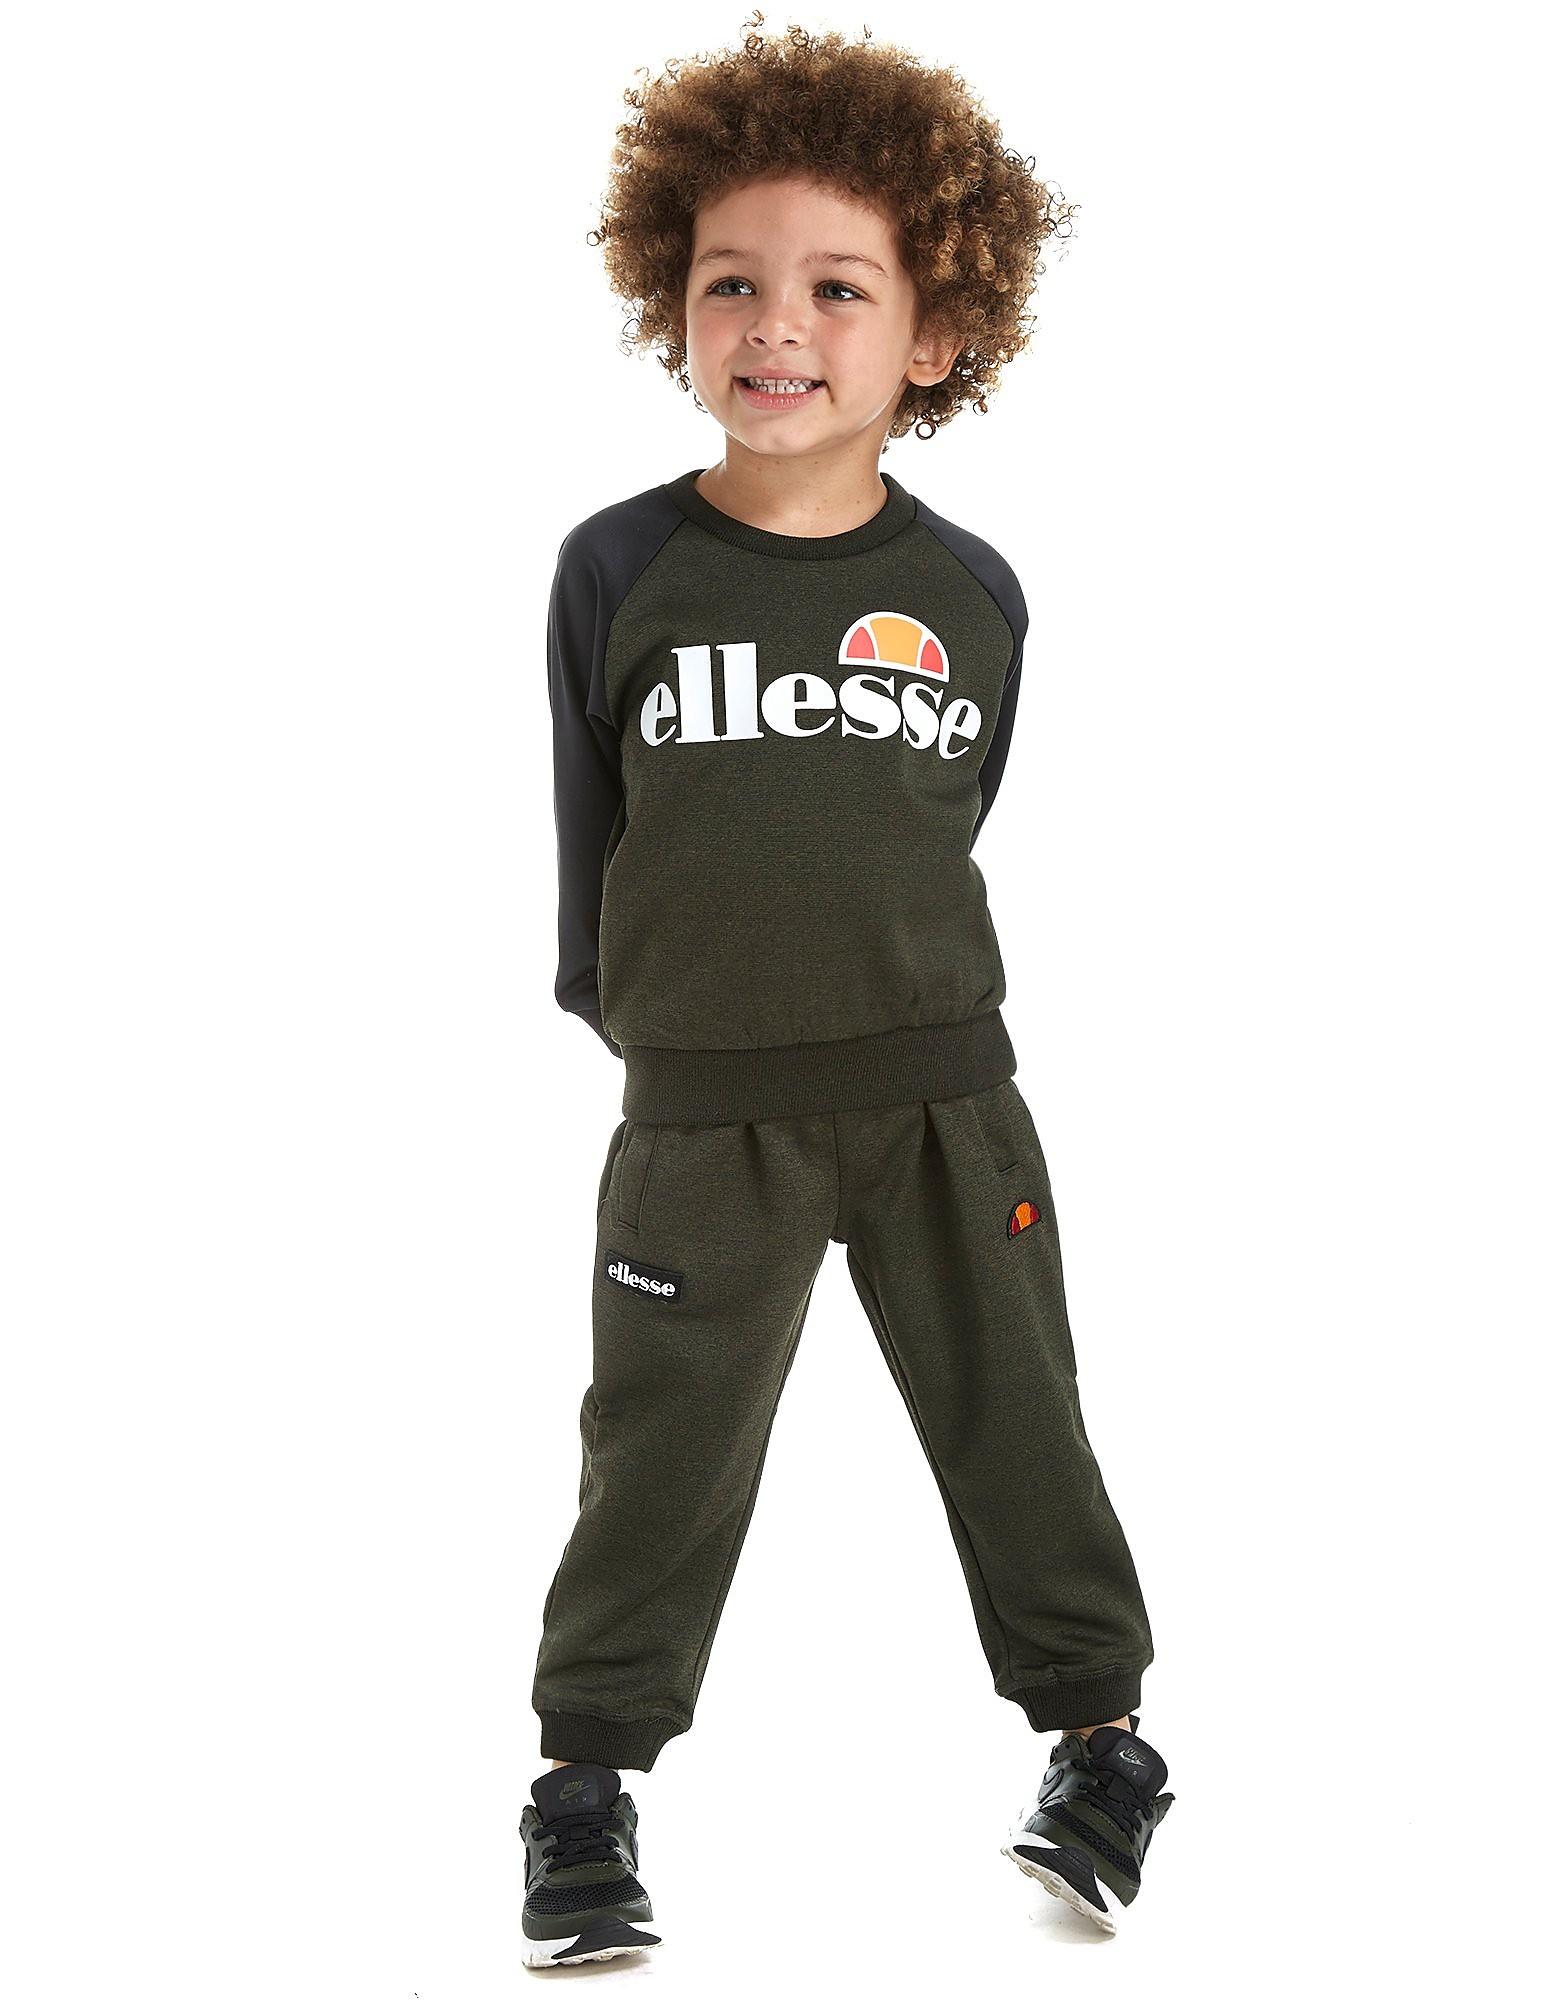 Ellesse Bervo Crew Suit Infants